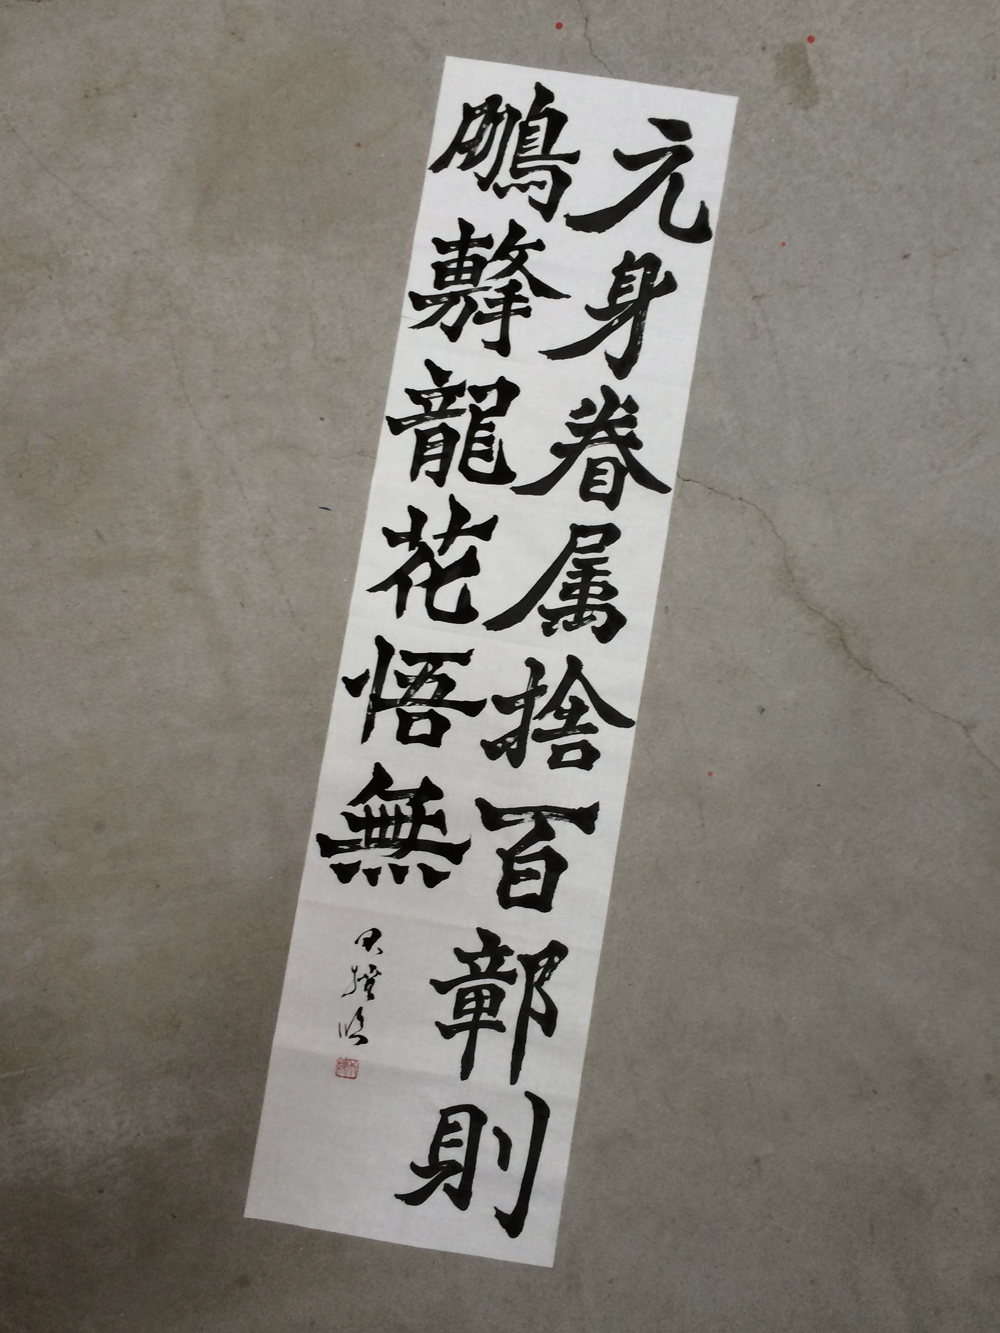 20140824_rin_gireizozoki_1.jpg